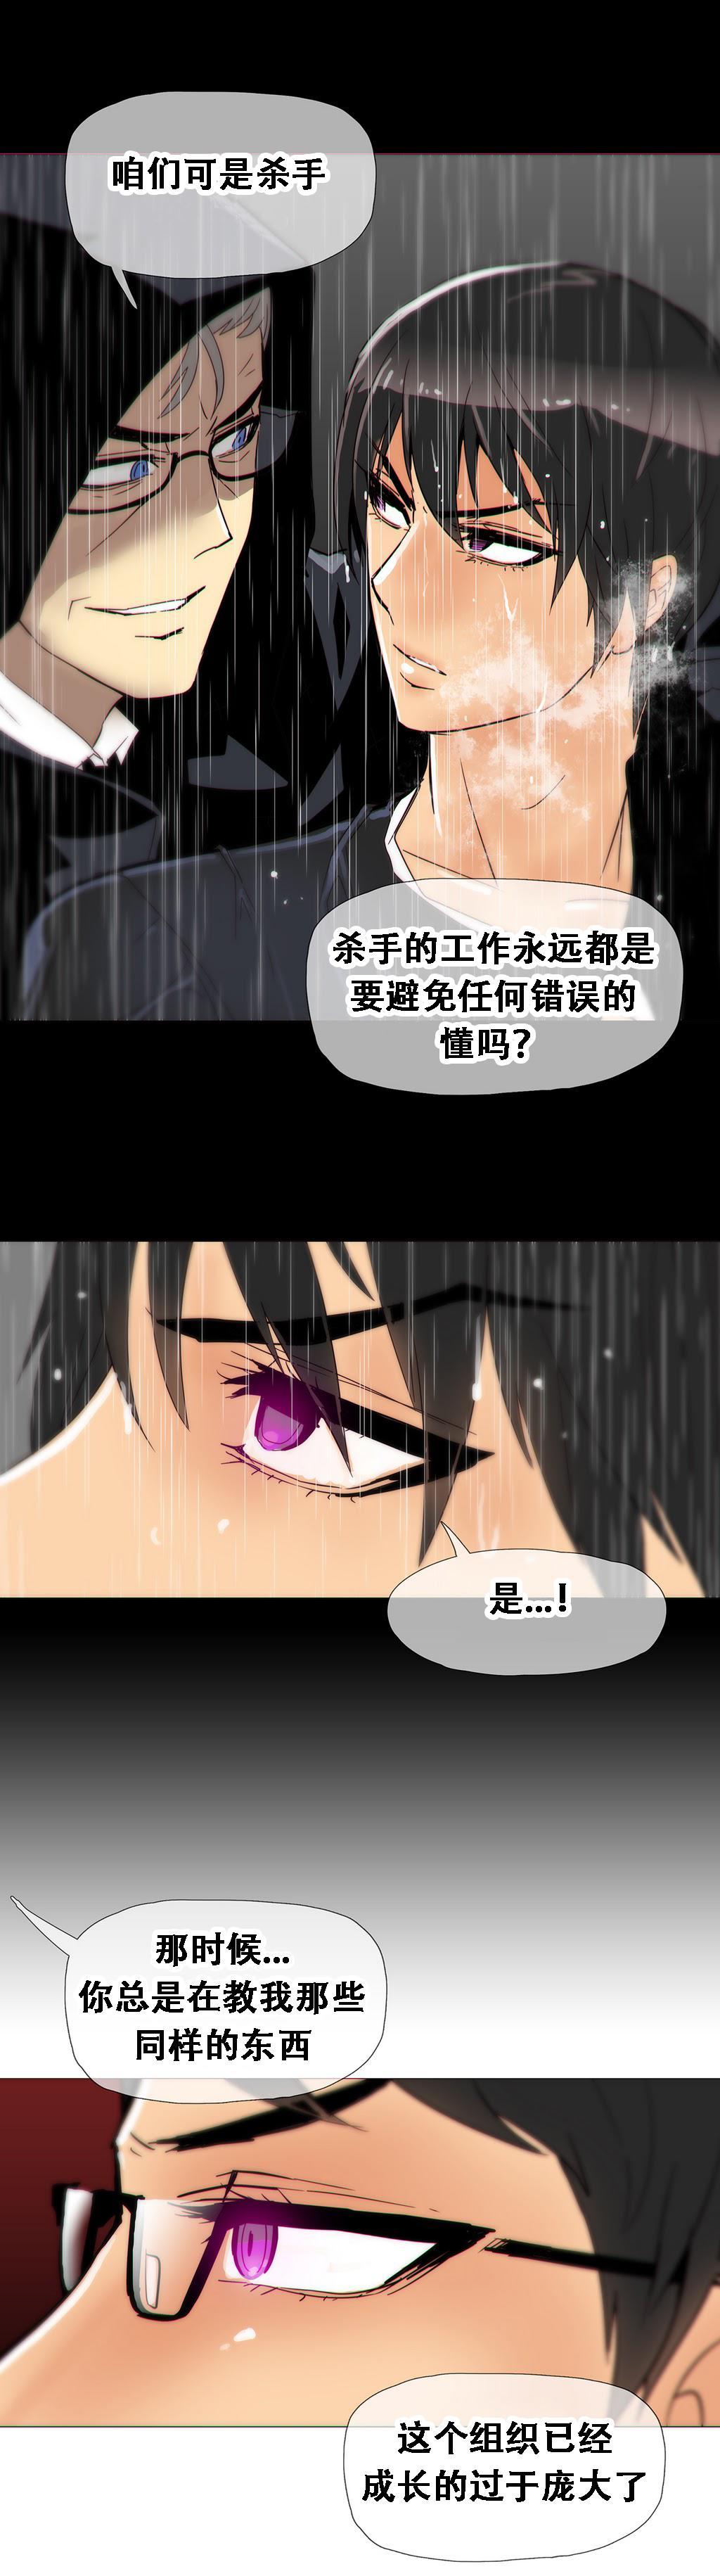 HouseHold Affairs 【卞赤鲤个人汉化】1~21话(持续更新中) 348